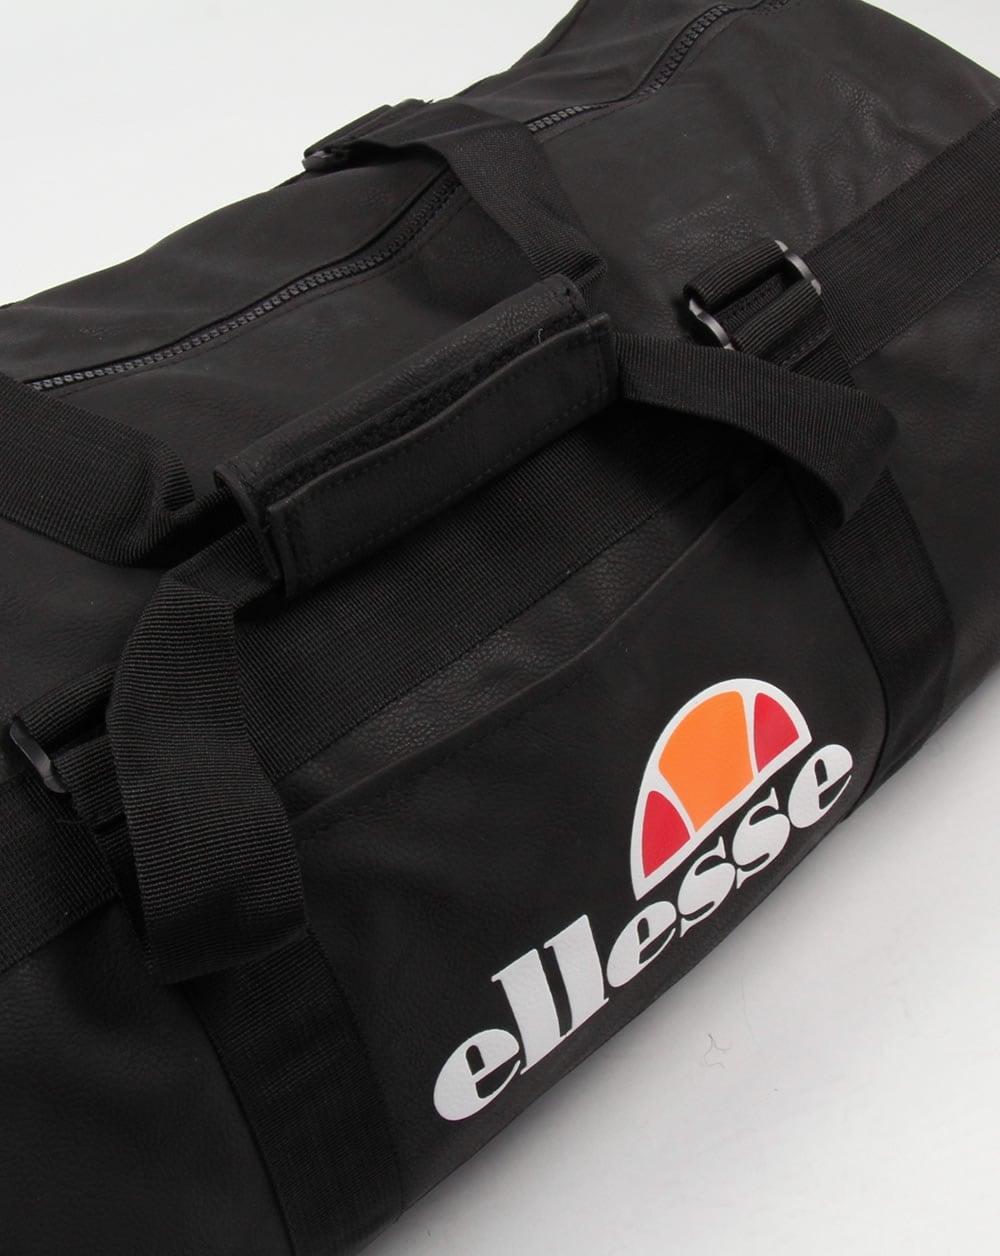 7e7cb5df0096 Ellesse Velore Lux Barrel Bag Black